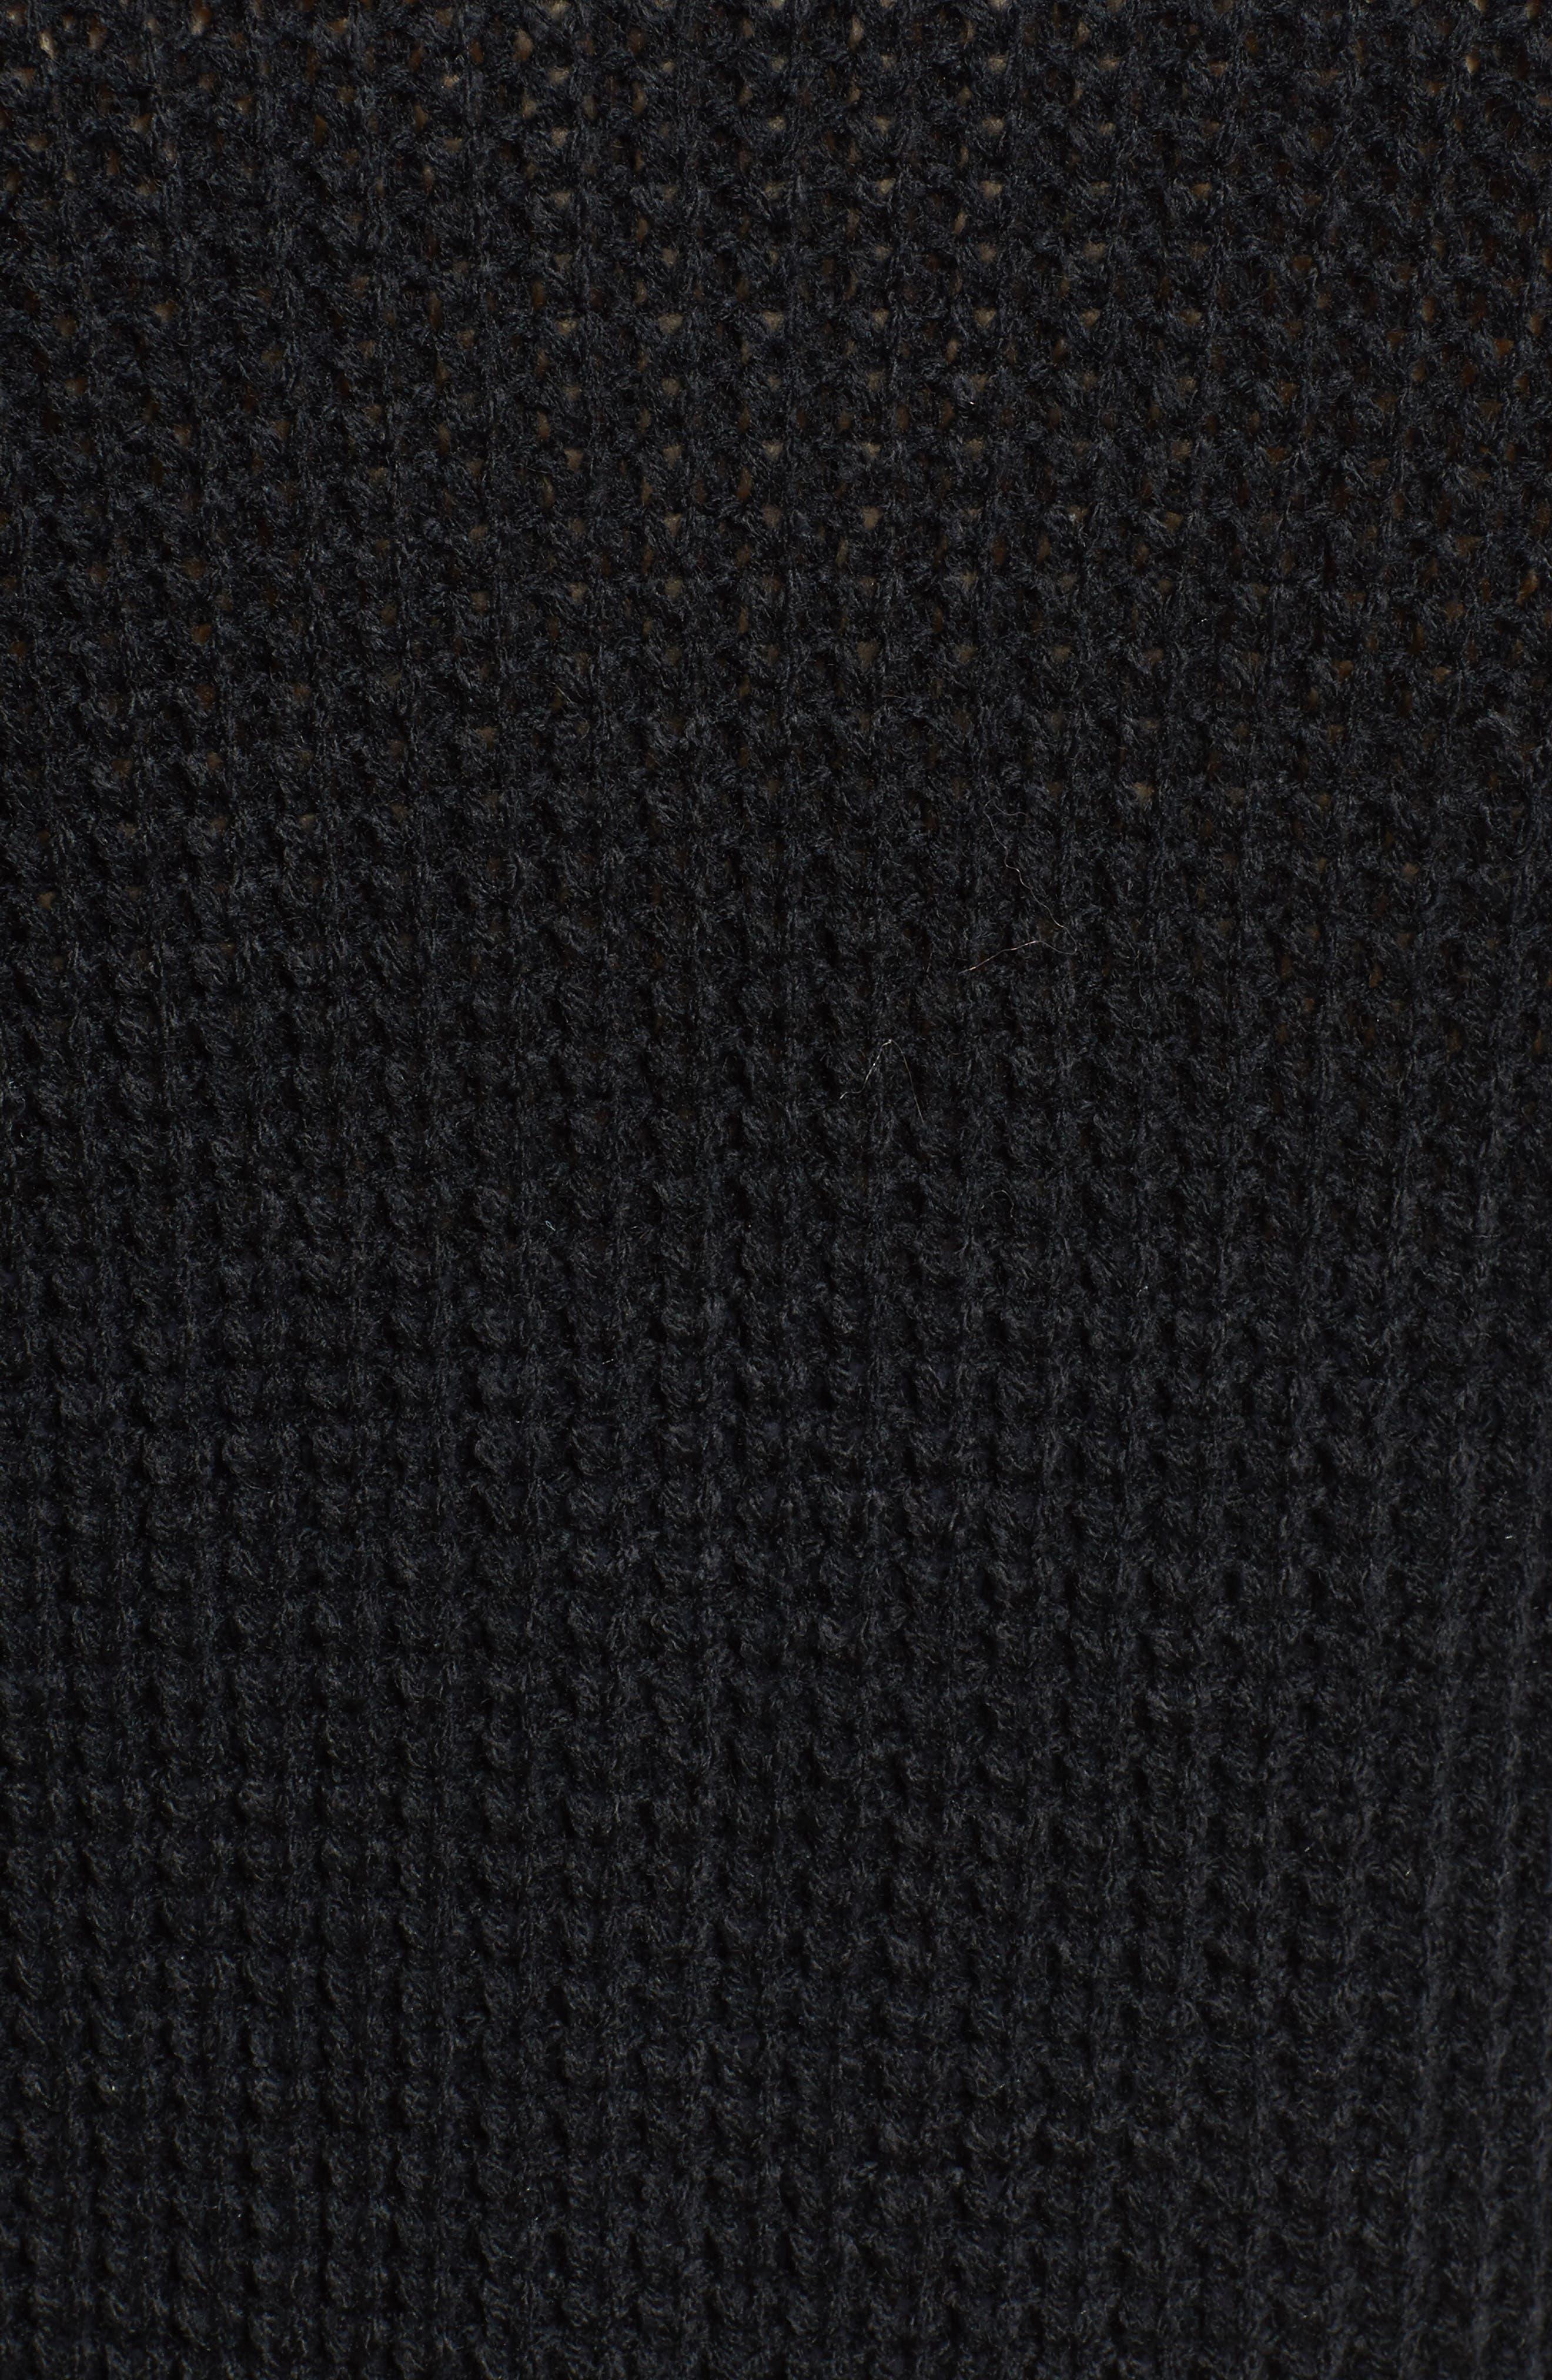 Faux Pearl Detail Cardigan,                             Alternate thumbnail 5, color,                             001